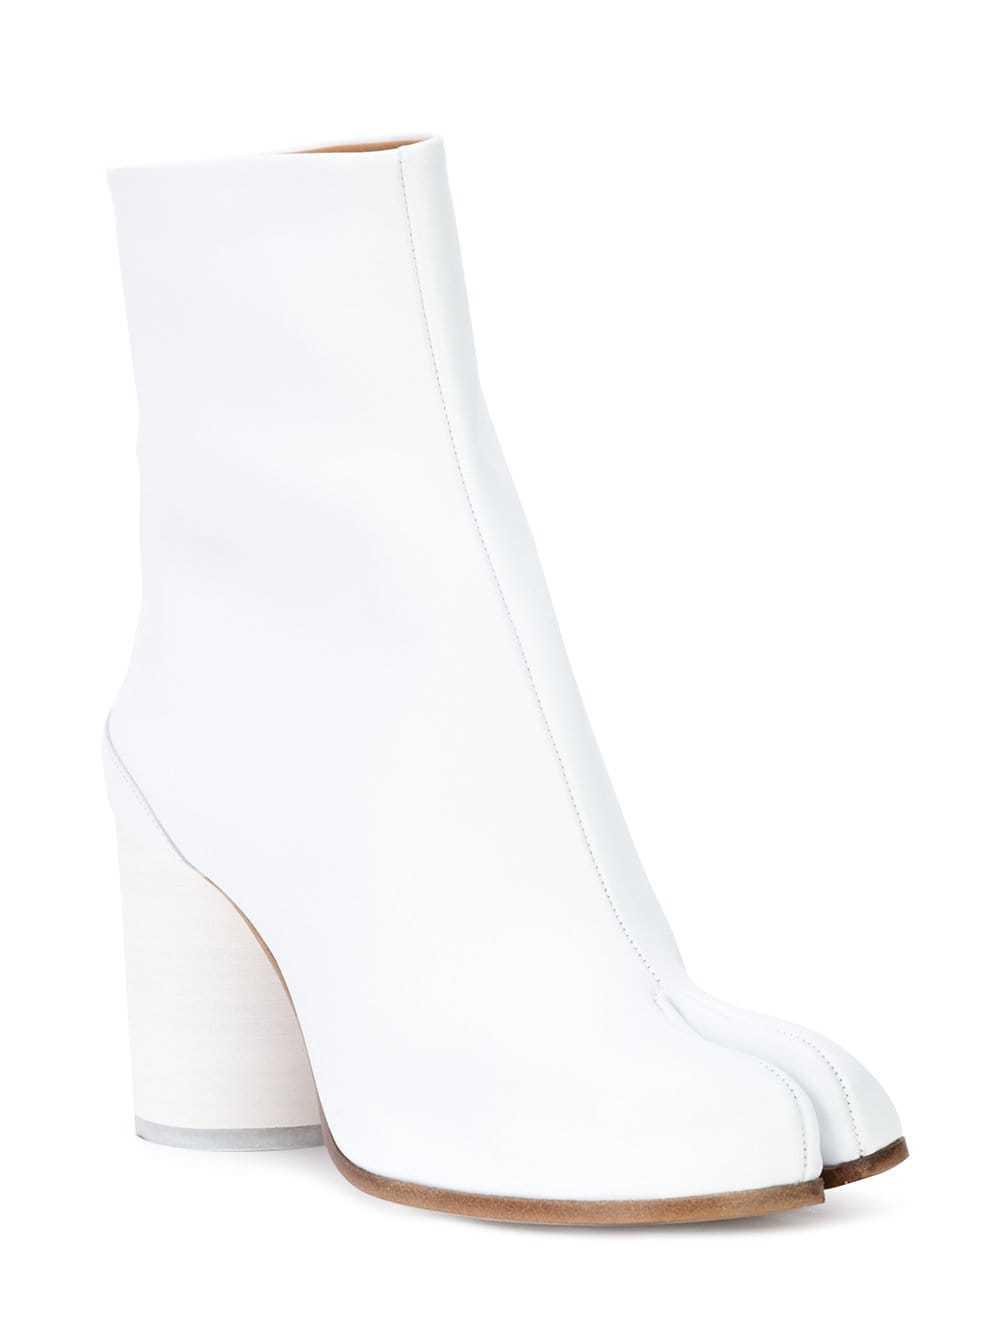 03b7417ec072 Maison Margiela Tabi Ankle Boots